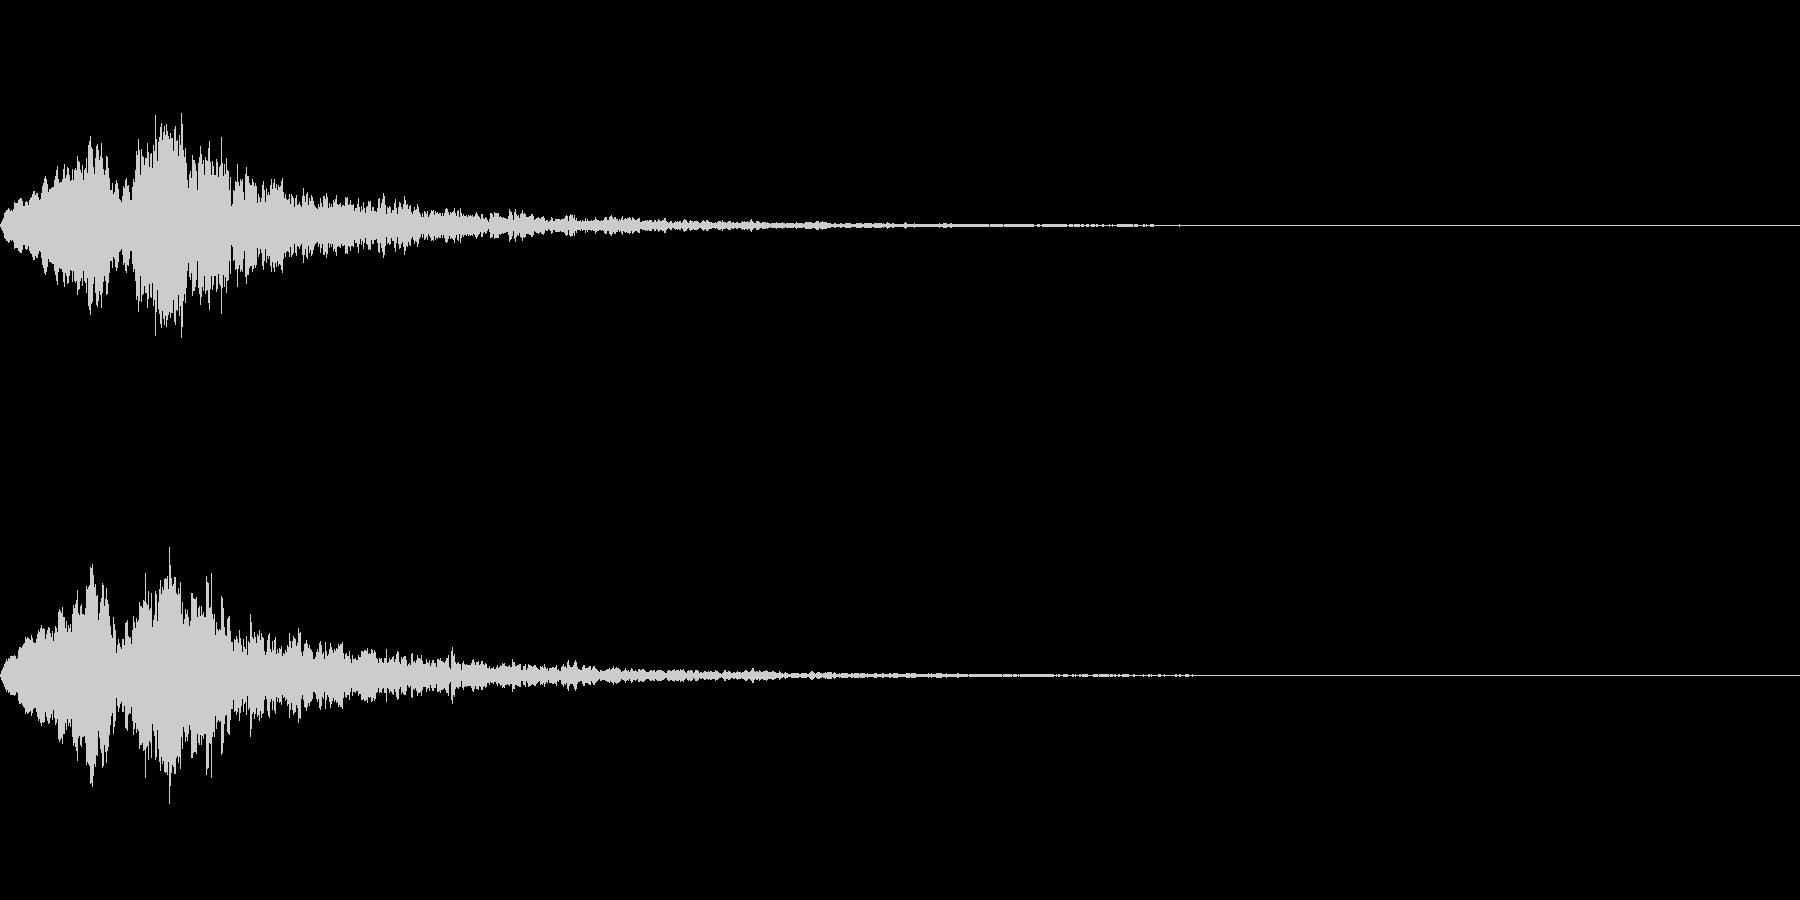 Vox 不気味な鳴き声 ホラーSE 2の未再生の波形